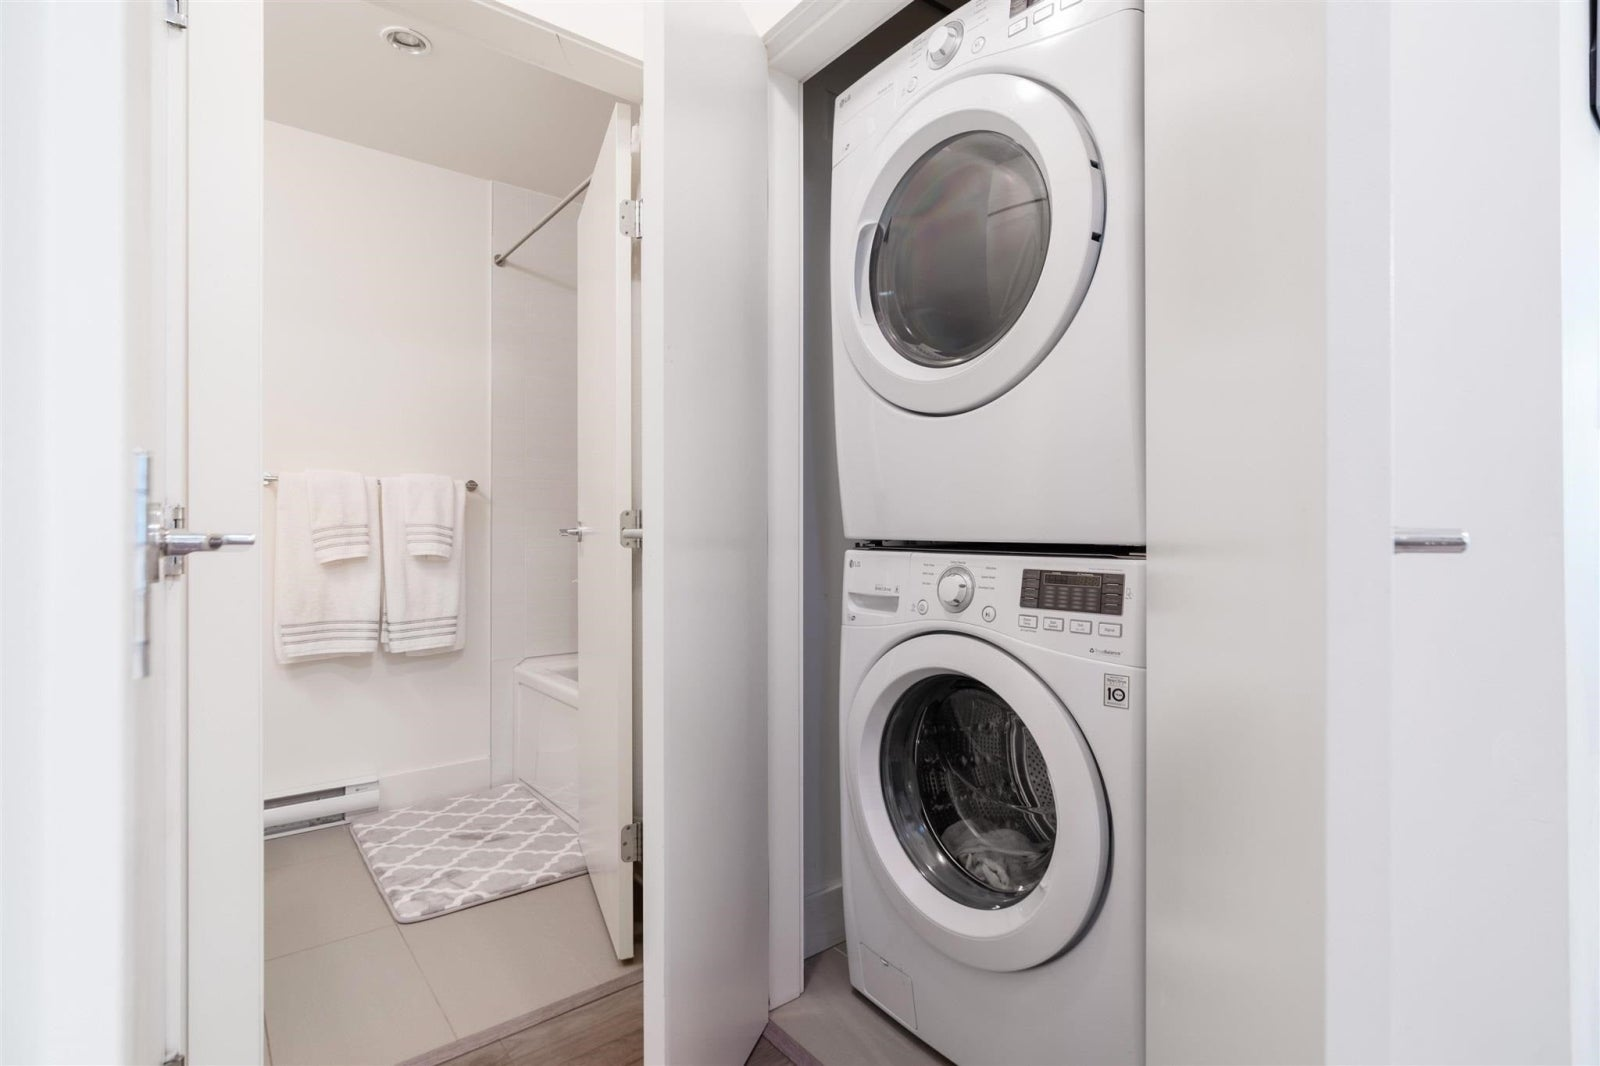 222 3602 ALDERCREST DRIVE - Roche Point Apartment/Condo for sale, 2 Bedrooms (R2603975) #15